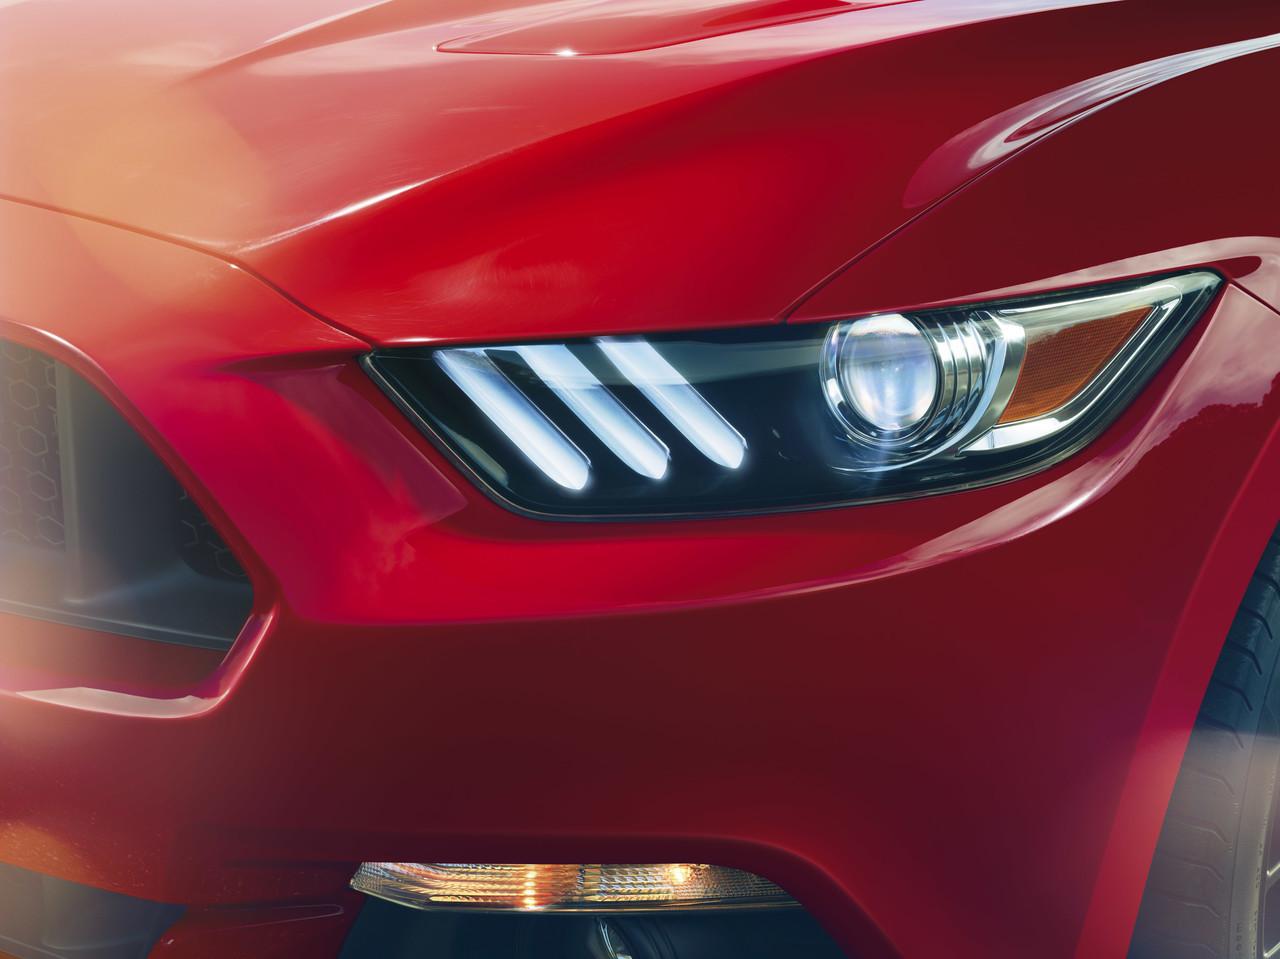 Foto de Ford Mustang 2014 (7/15)